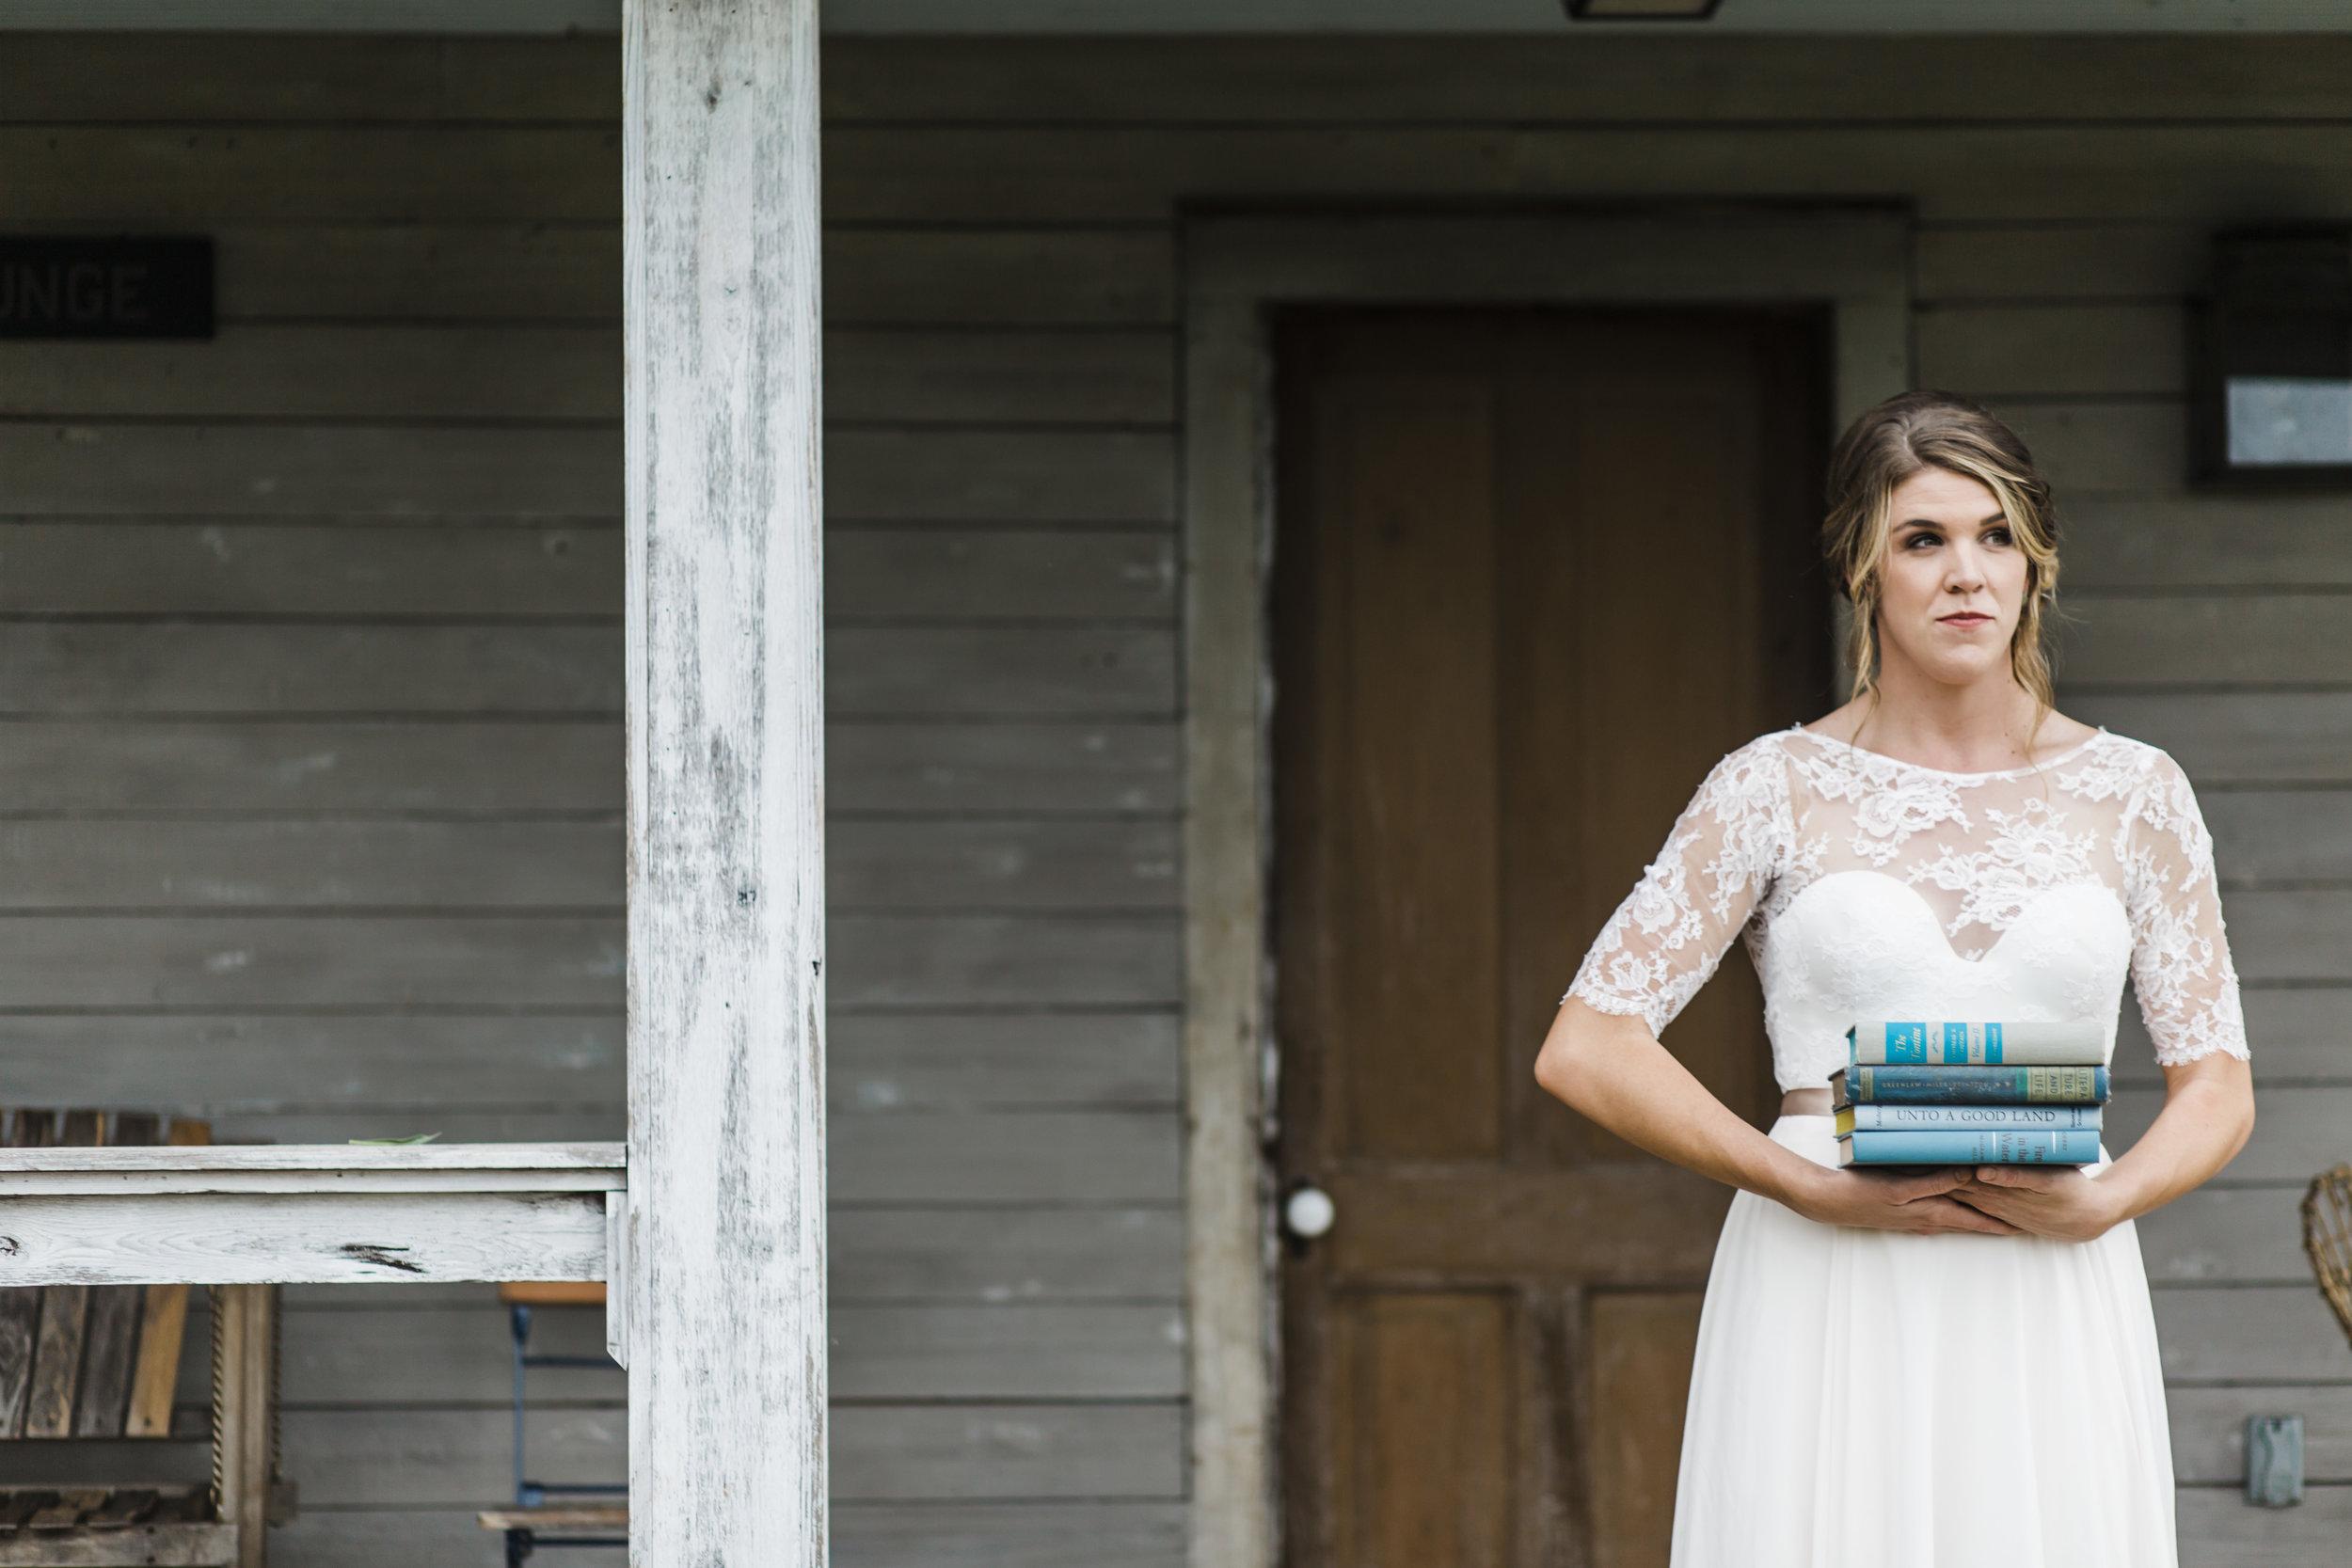 tsali notch knoxville wedding photographer